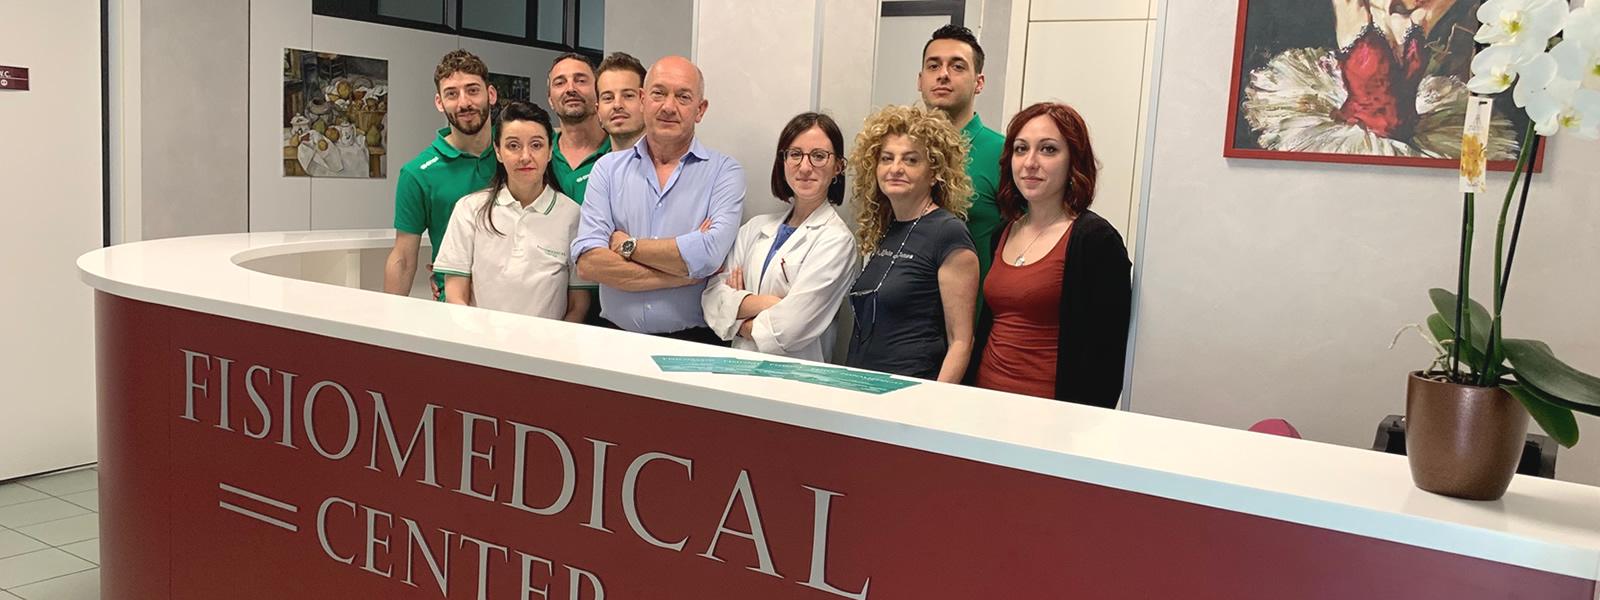 Staff Fisiomedical Perugia